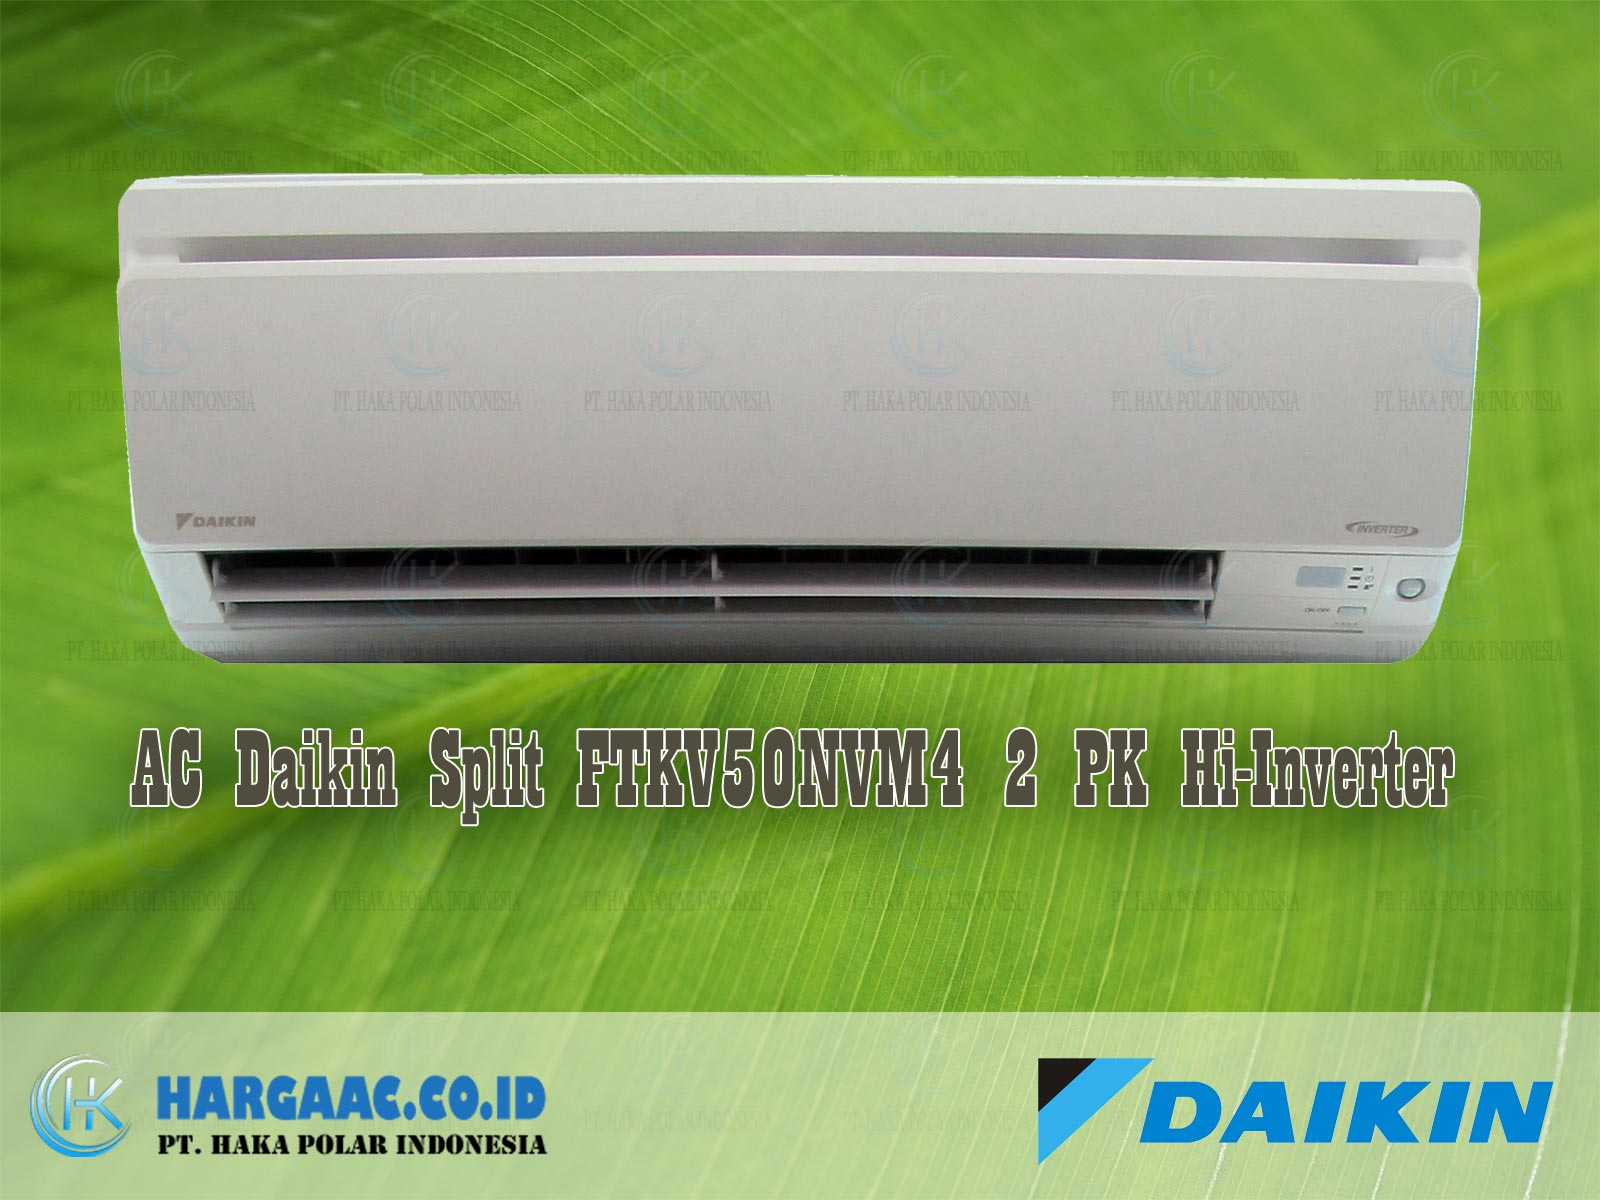 Ac Daikin Split Ftkv50nvm4 2 Pk High Inverter Putih Daftar Update Standard 1 R32 Rv Ftv25axv14 Indoor Outdoor Only Jual Hi